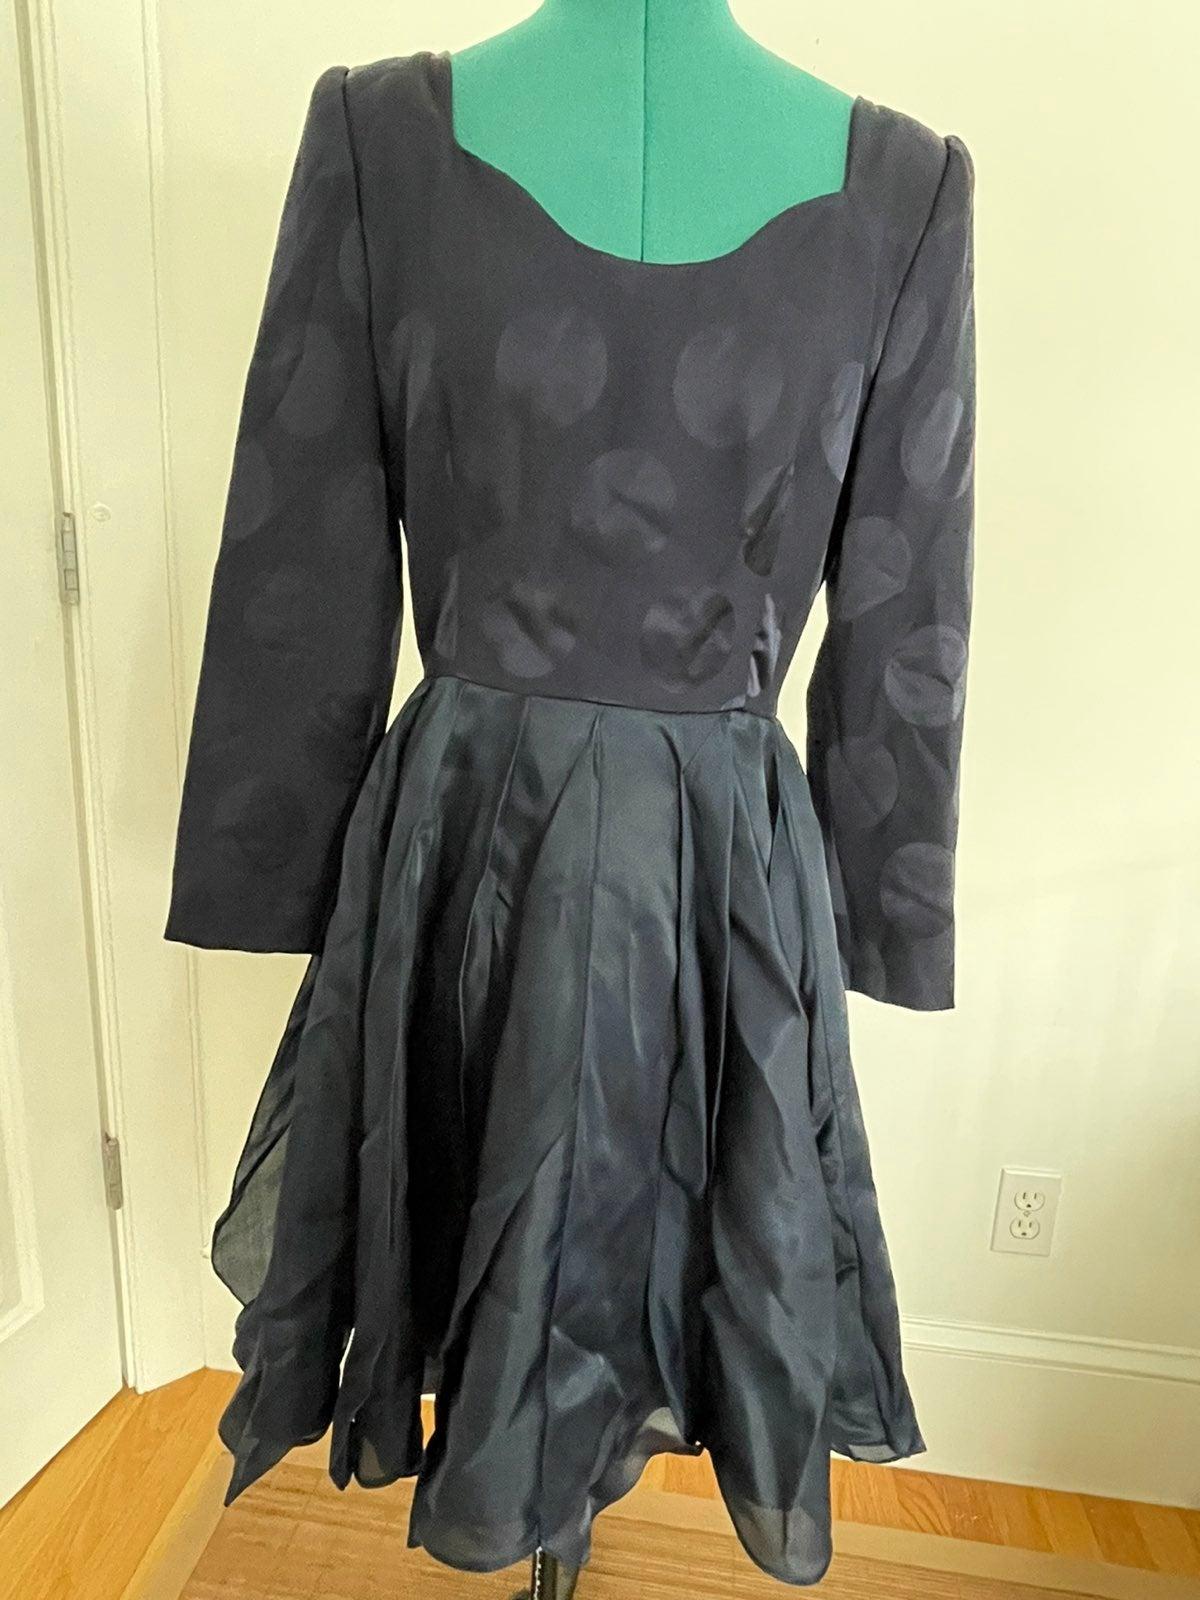 Carolina Herrera silk navy dress sz 6